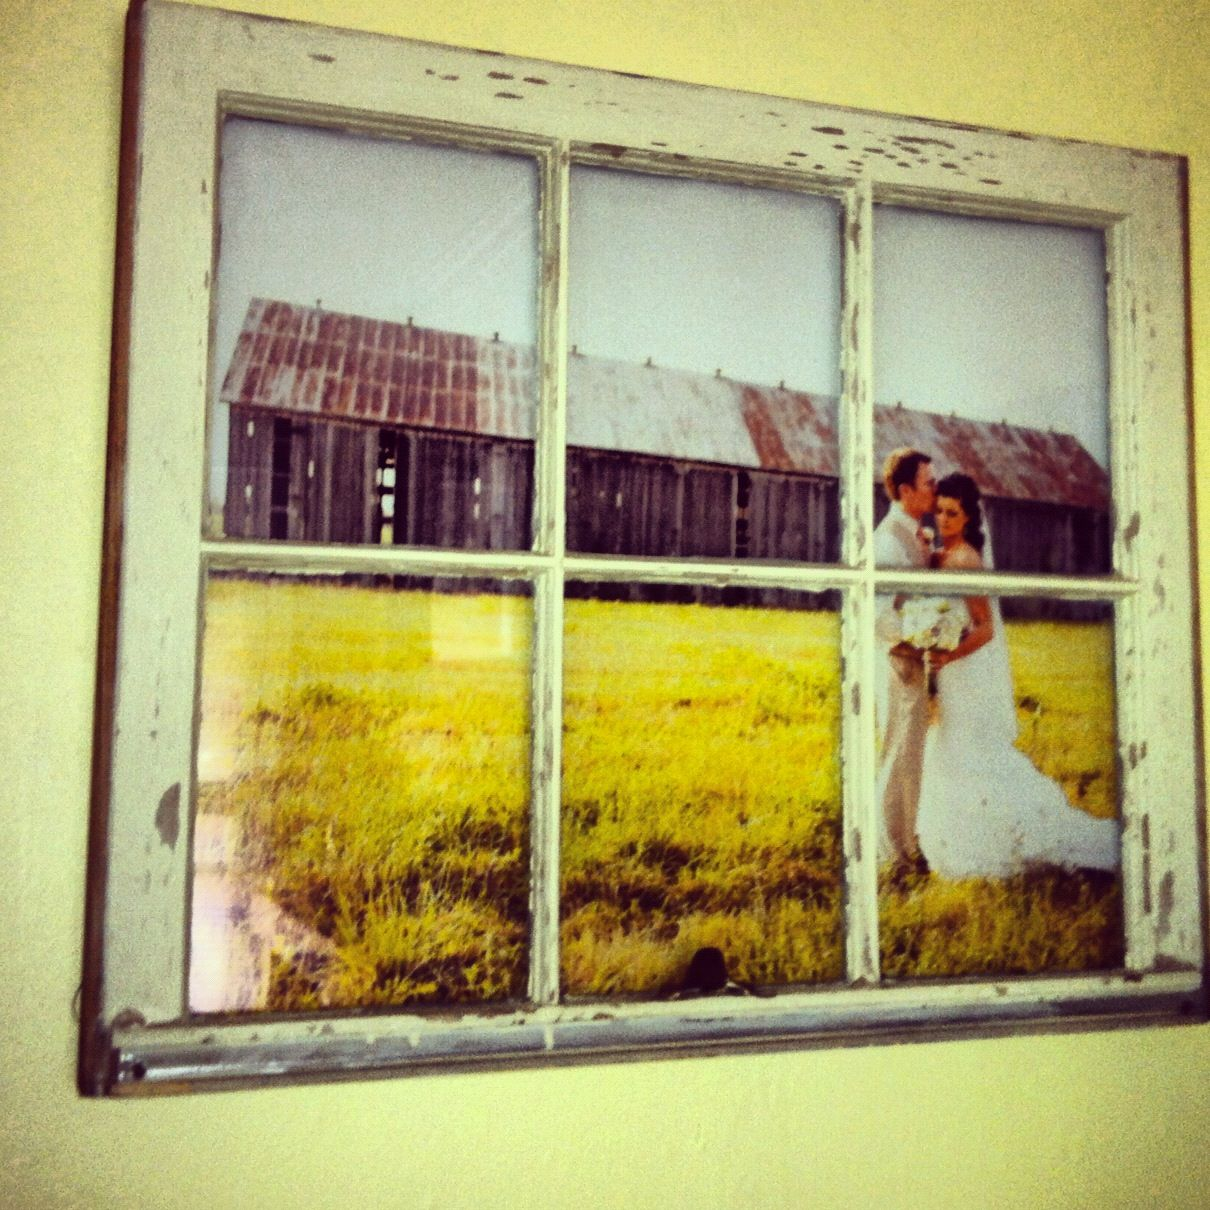 diy vintage window pane picture frame - Window Frame Picture Frame